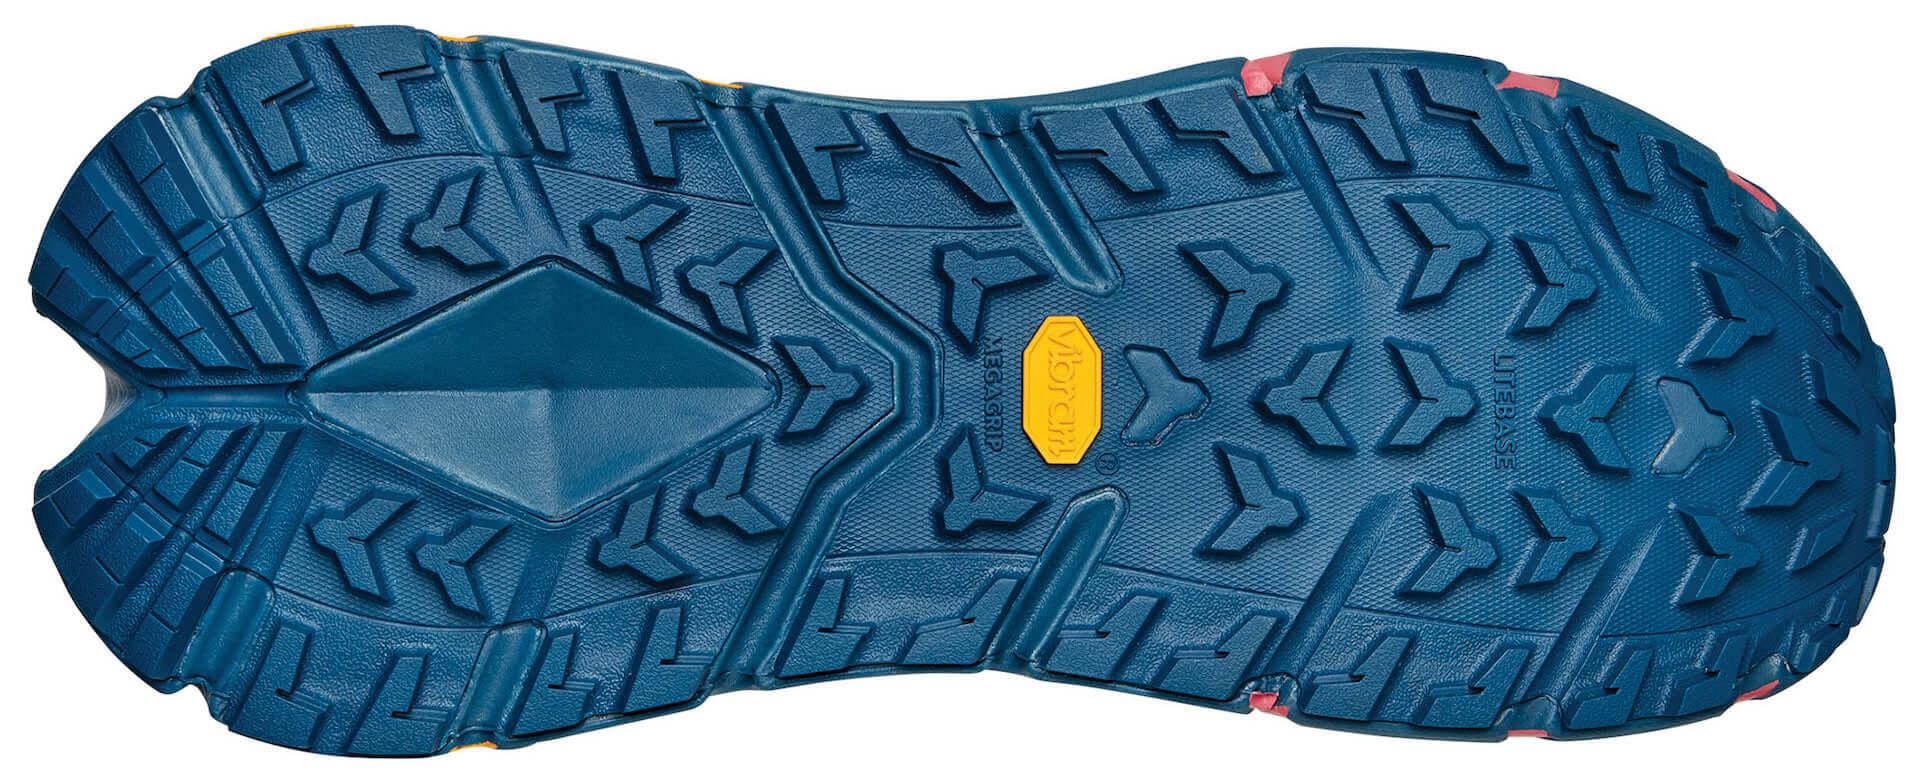 HOKA ONE ONEが防水ハイキングブーツ『TenNine Hike GTX』を発表!リサイクル繊維素材を使用&「GORE-TEX」も搭載 lf201029_hokaoneone_4-1920x773